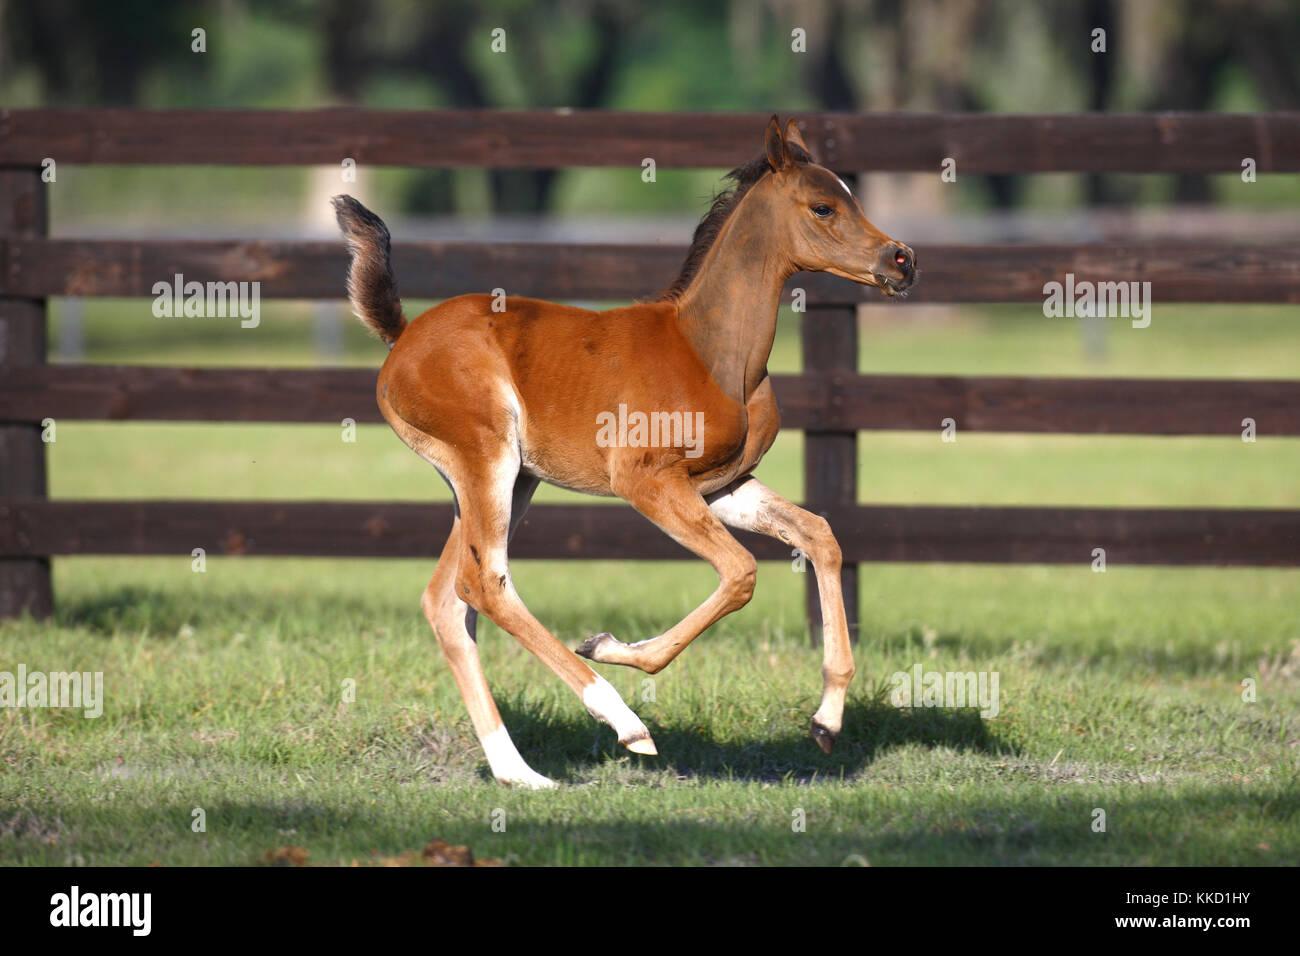 Arab foal Headshot - Stock Image